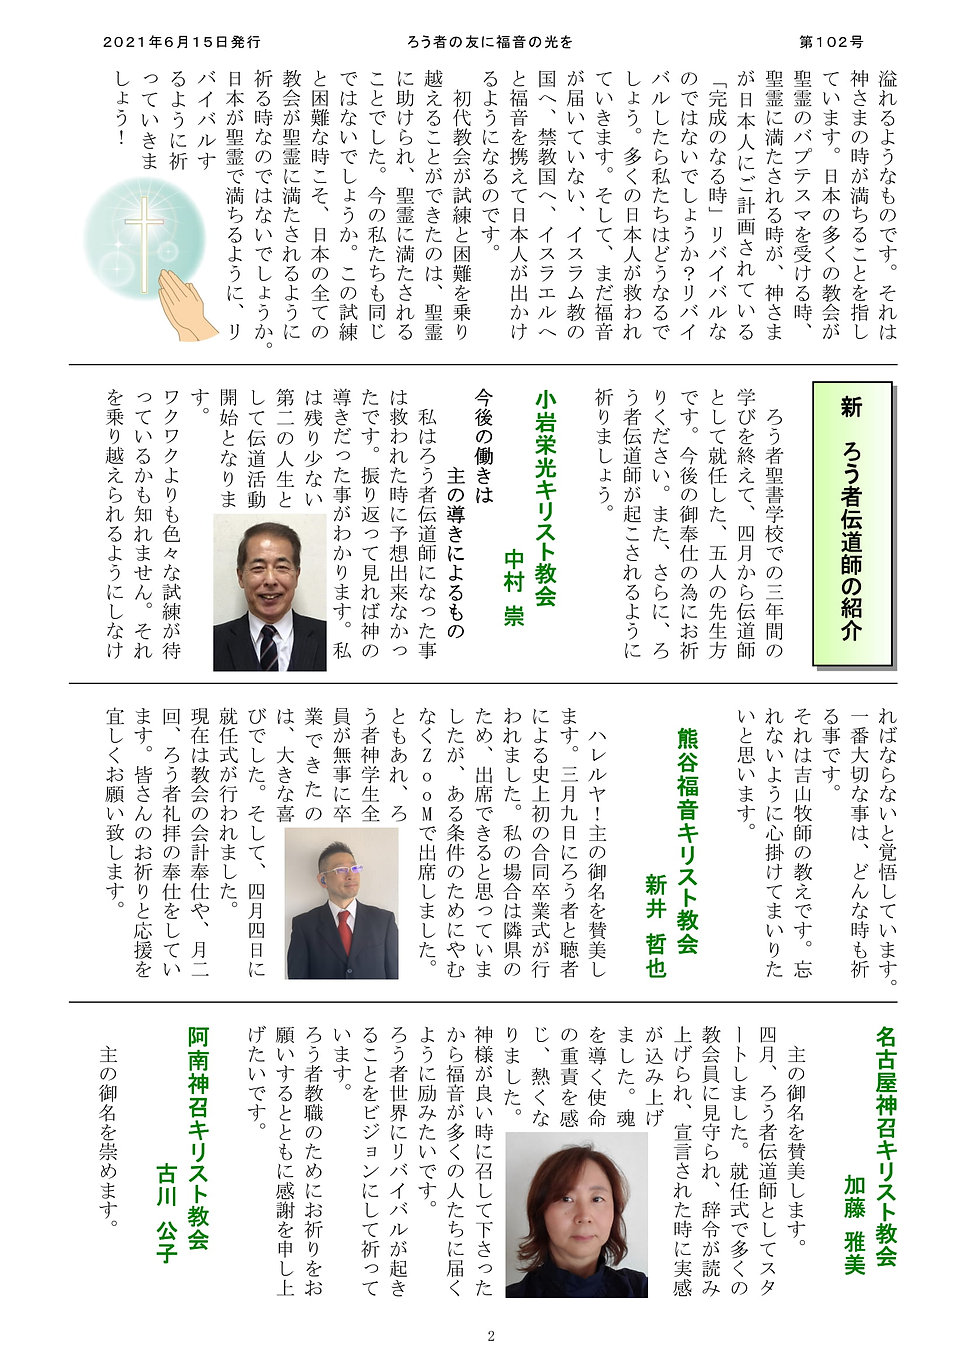 Taro-エパタ102 2021 6月15日-2.jpg